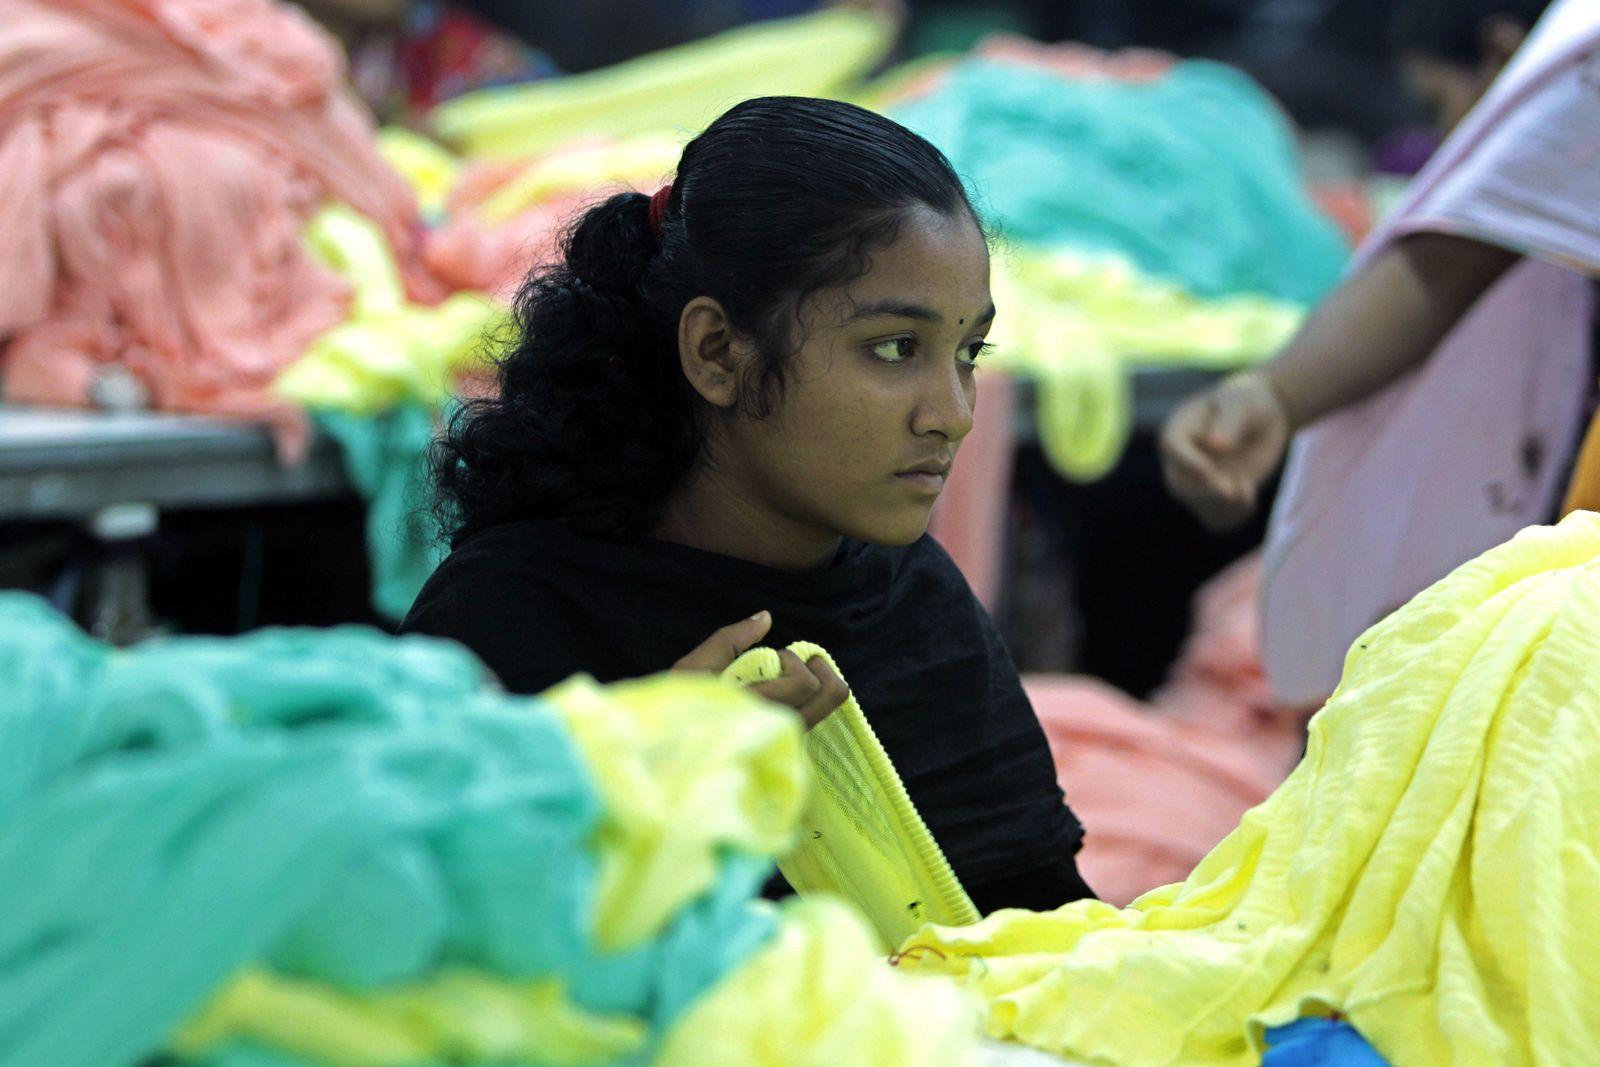 Bangladesh Factory Fire Retailers